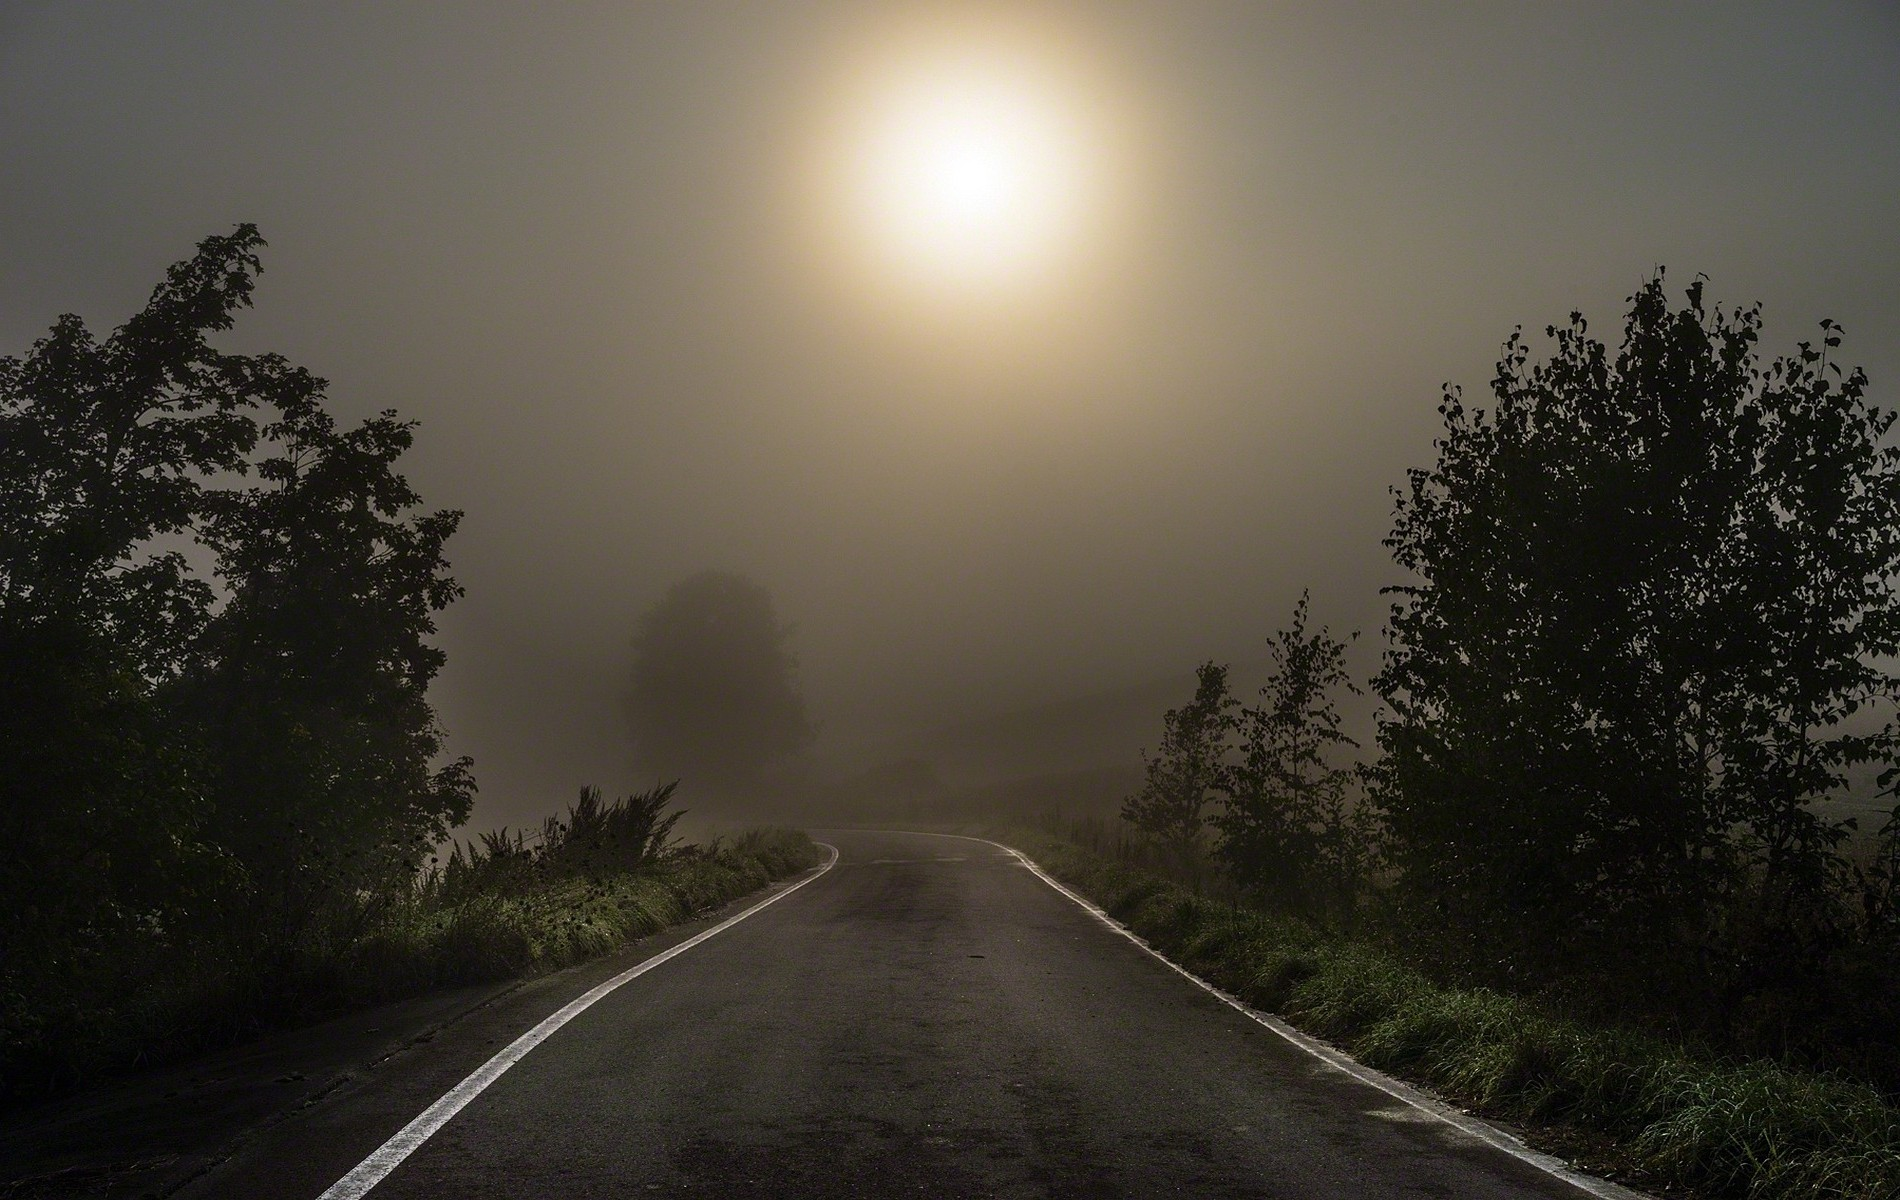 Asphalt 8 Wallpaper Cars Nature Landscape Mist Morning Road Trees Dark